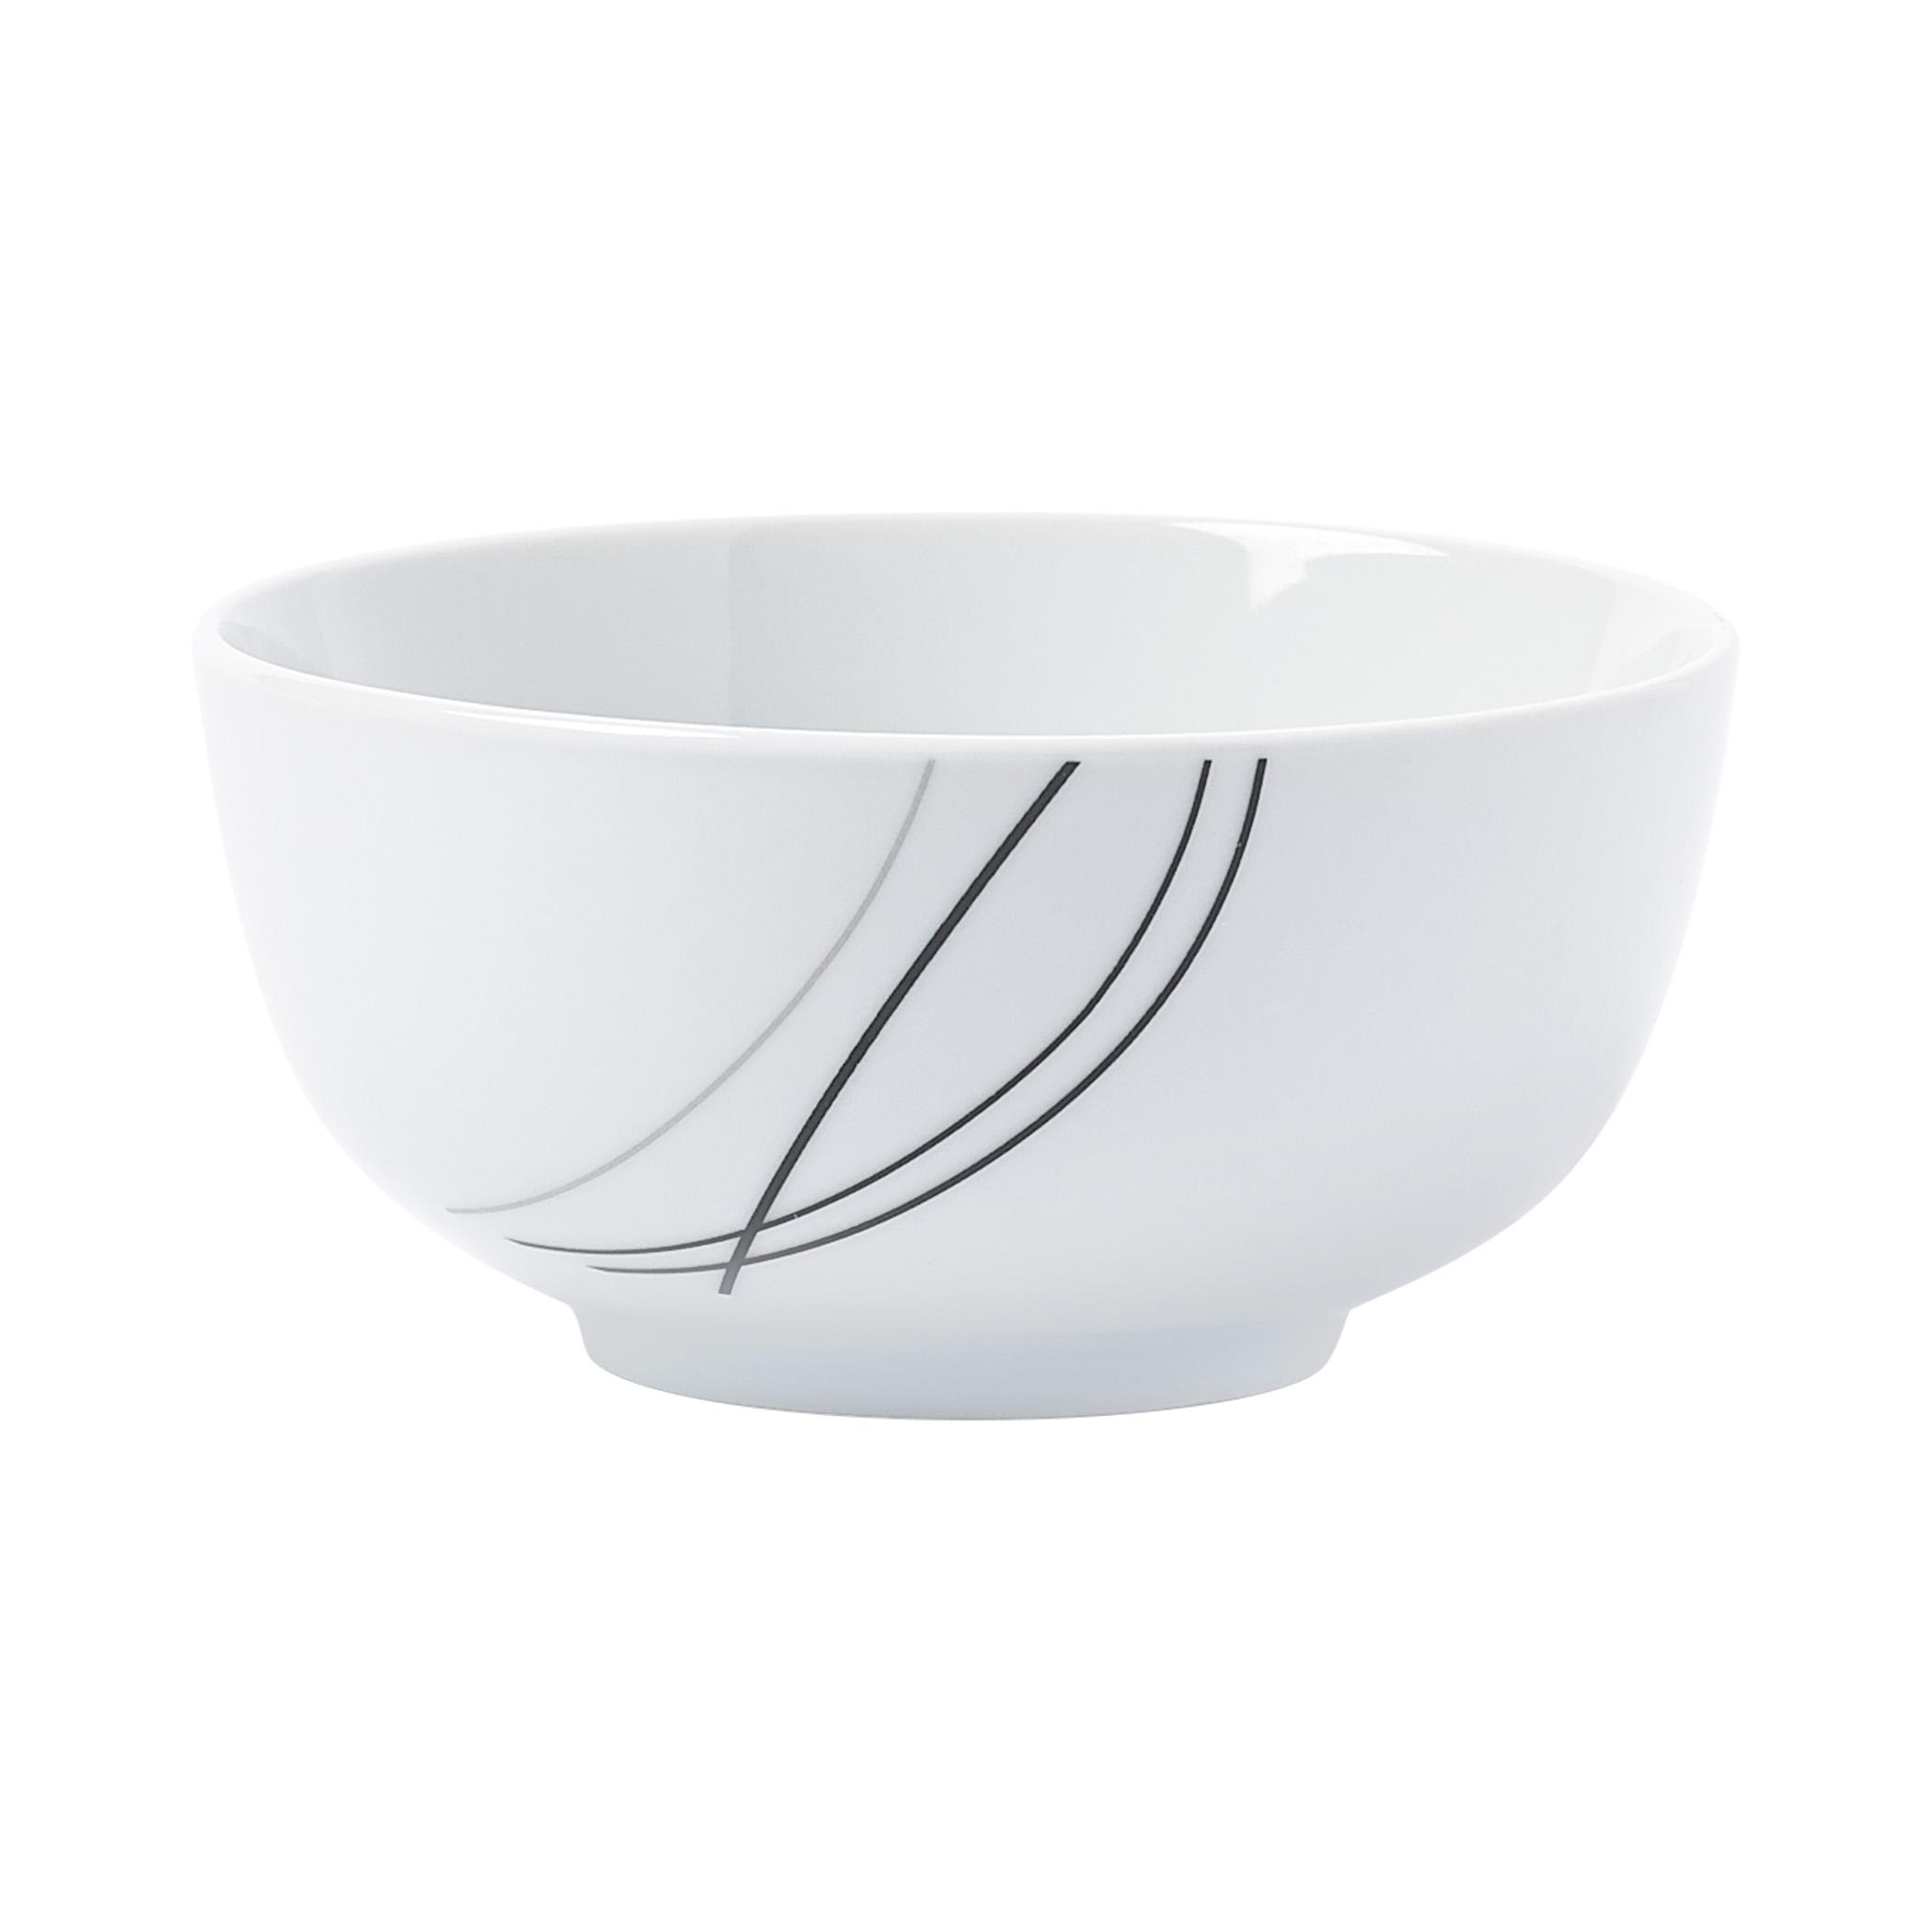 ... TTU-T4140-EC-16 Piece Porcelain Dinnerware Set by Tabletops Gallery_3 ...  sc 1 st  Tabletops Unlimited & 16 Piece Porcelain Dinnerware Set by Tabletops Gallery® | Tabletops ...